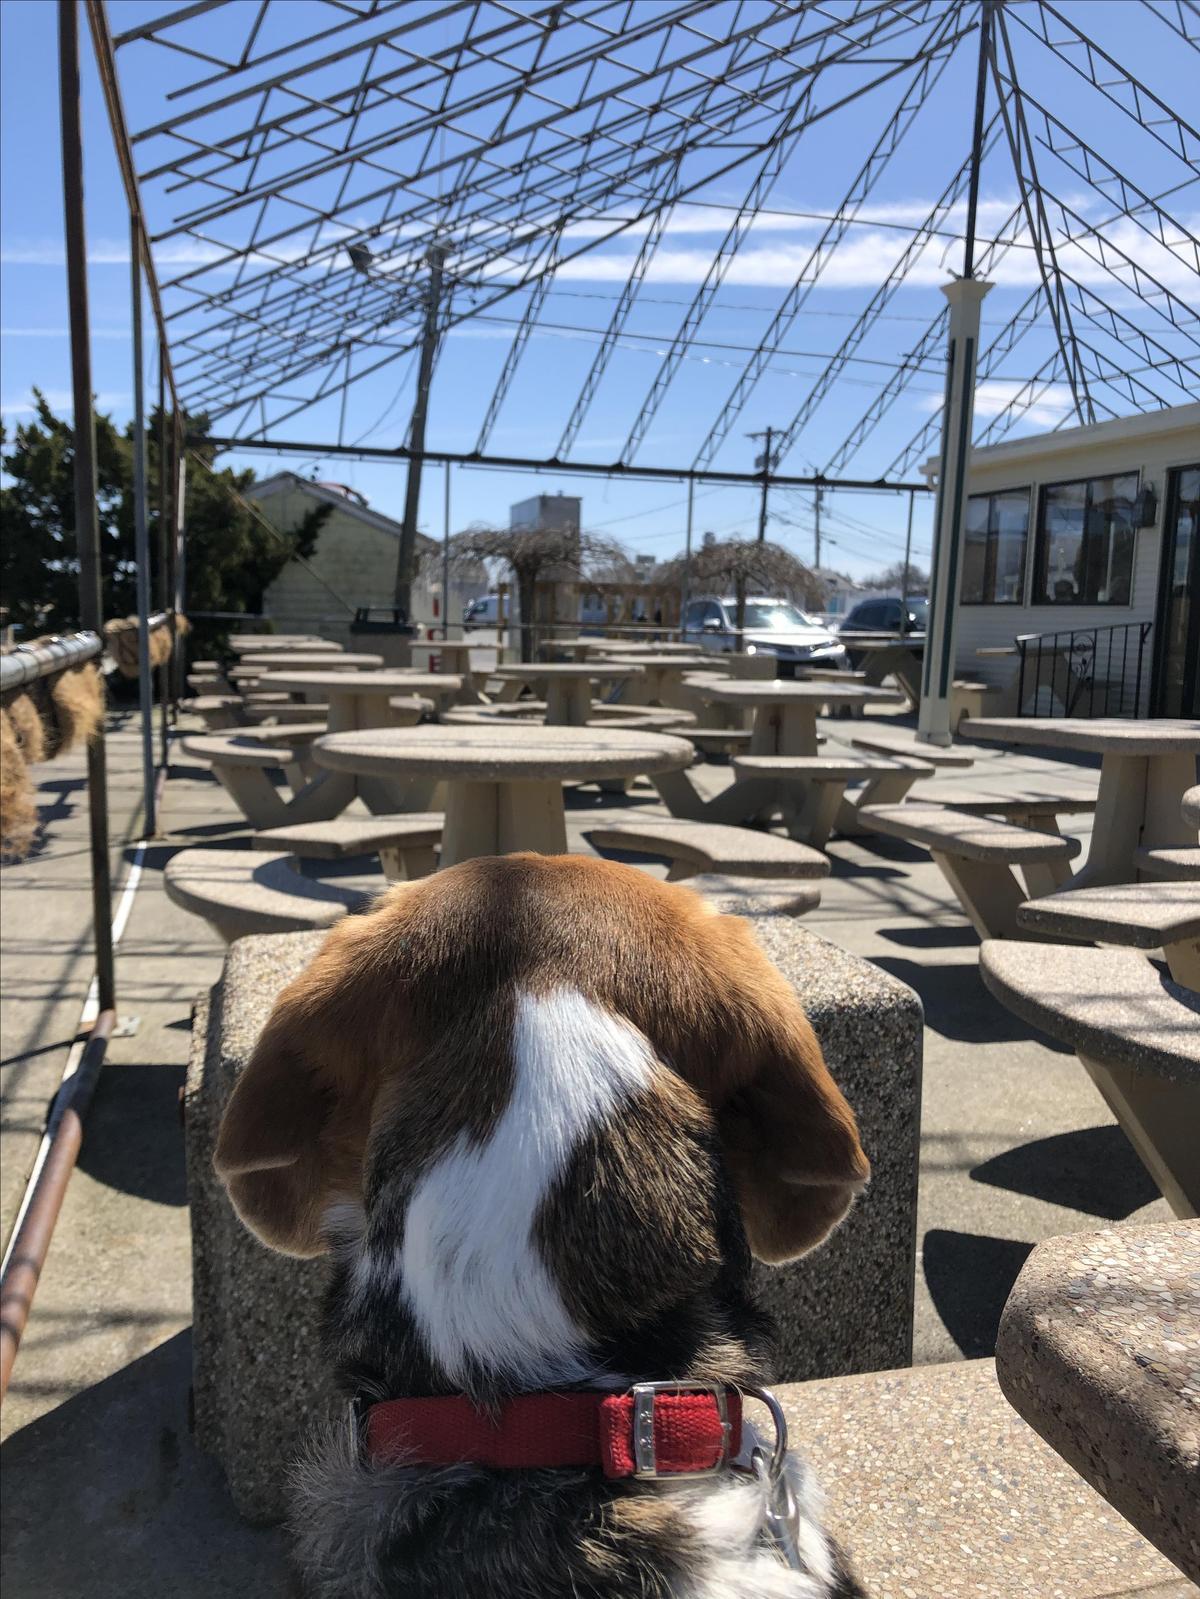 Barkley the beagle